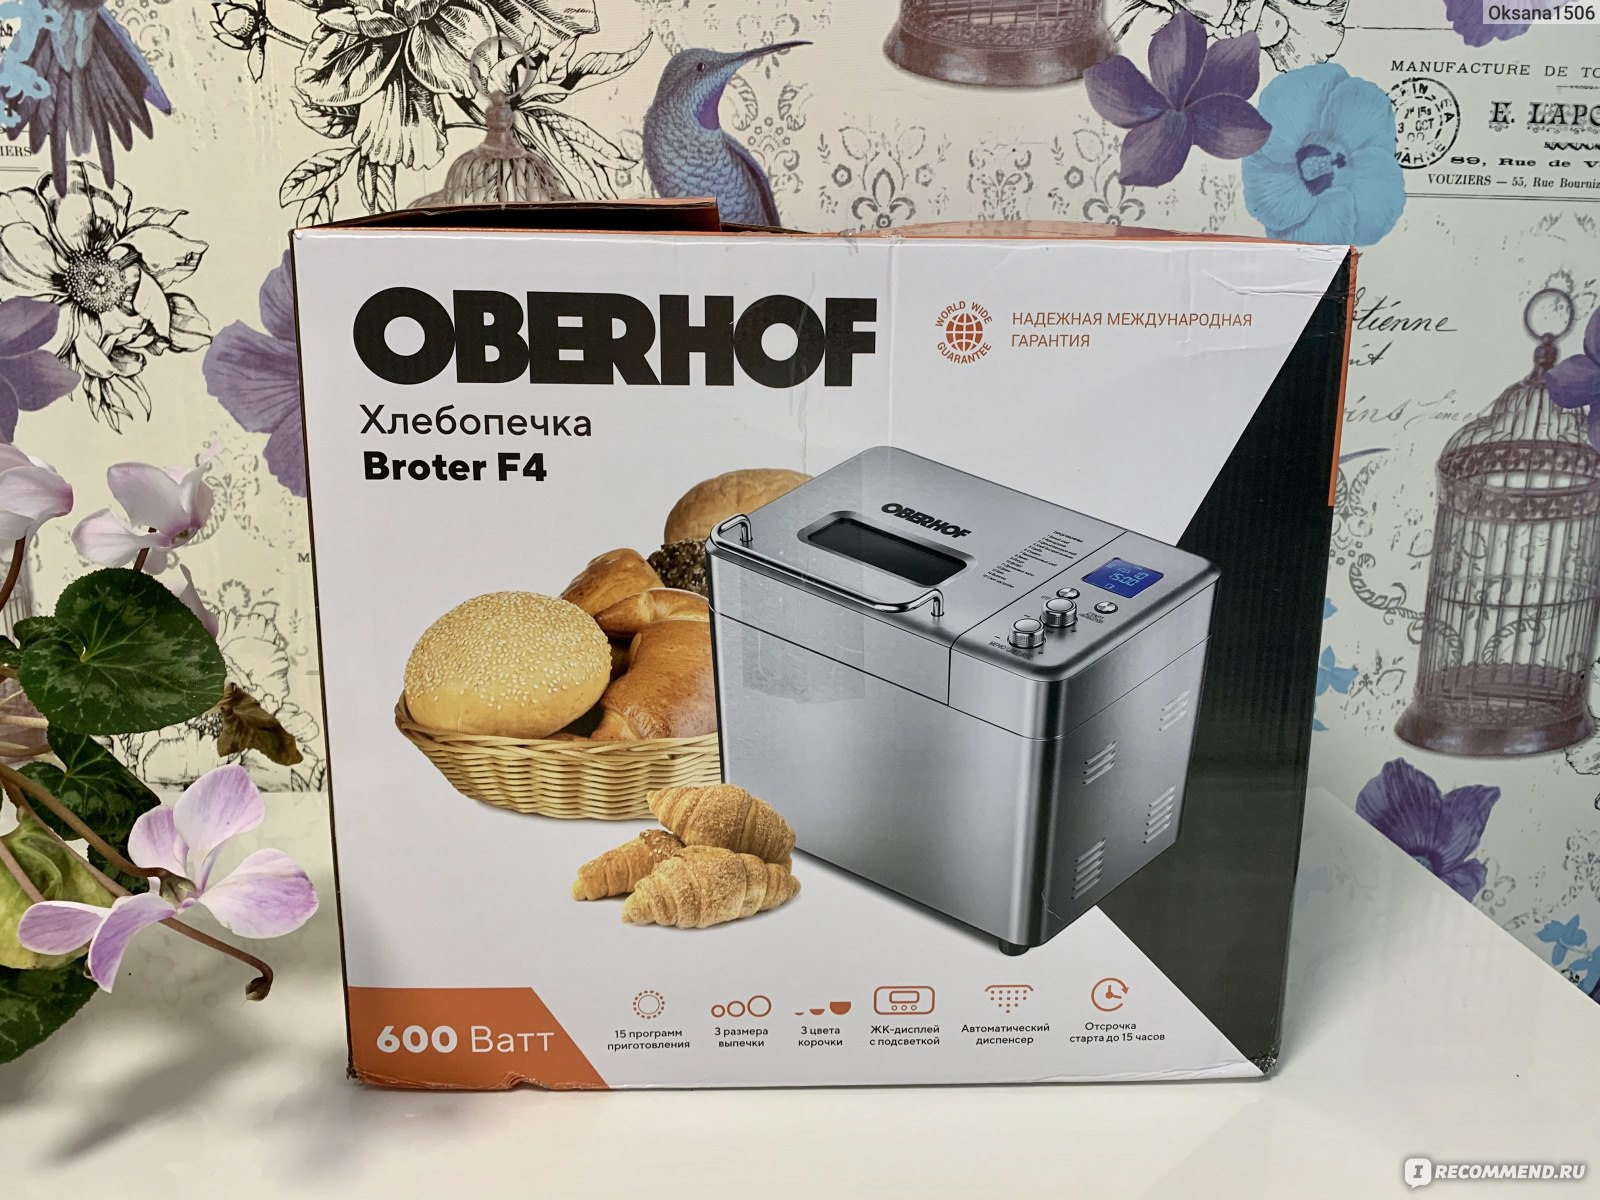 Хлебопечка OBERHOF Broter F4/ Автоматическая хлебопечка ...